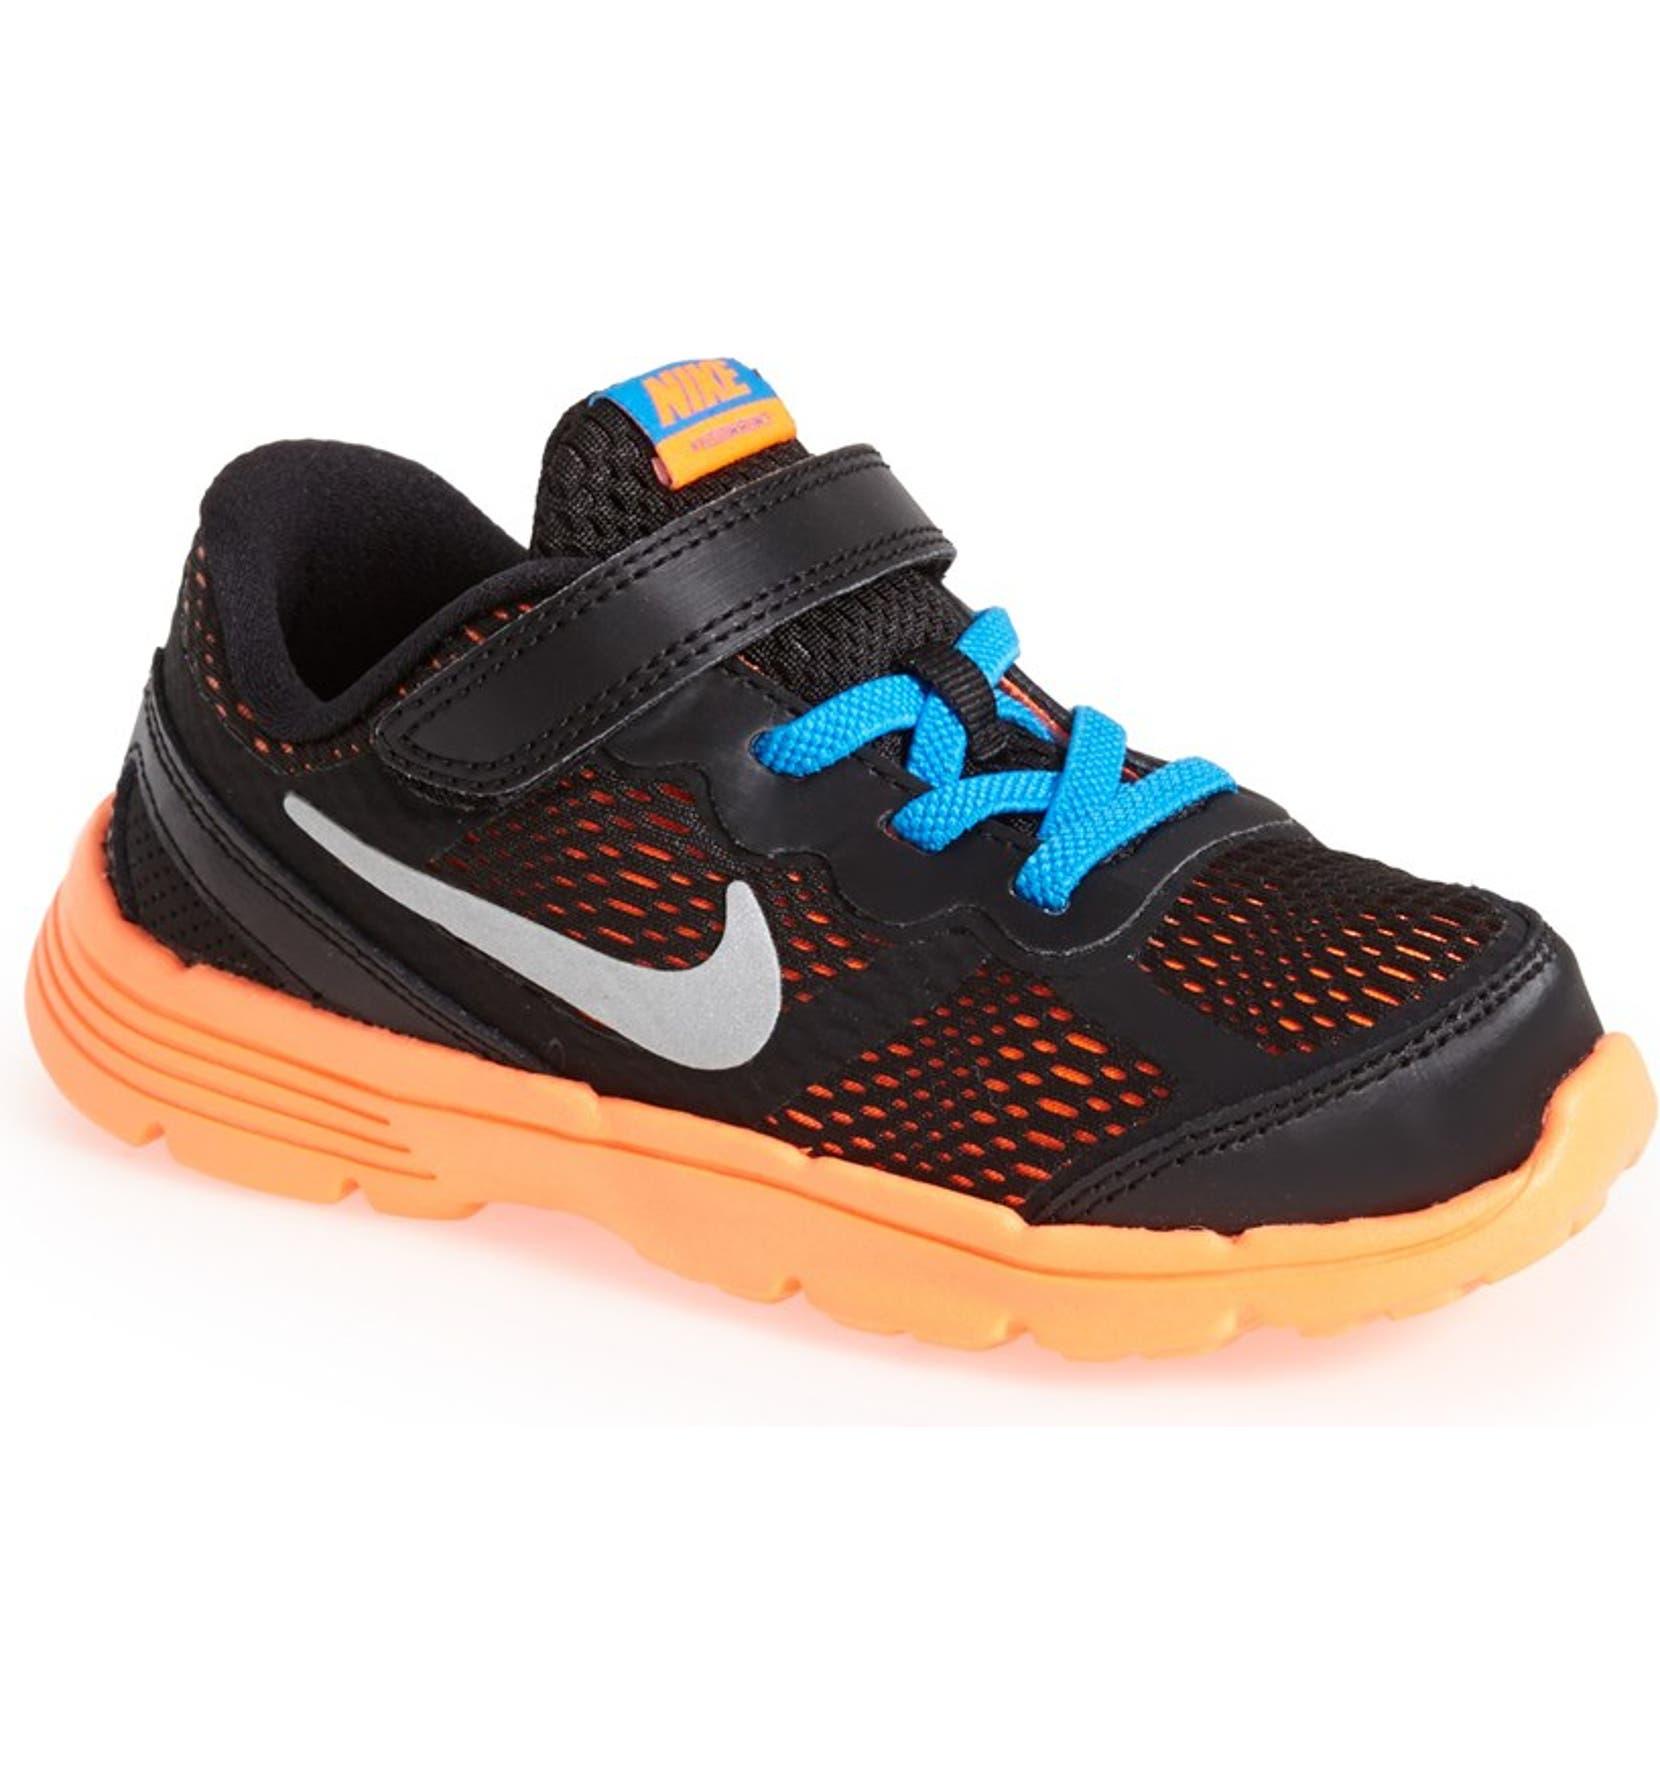 5e64b743136 Nike  Dual Fusion Run 3  Athletic Shoe (Baby